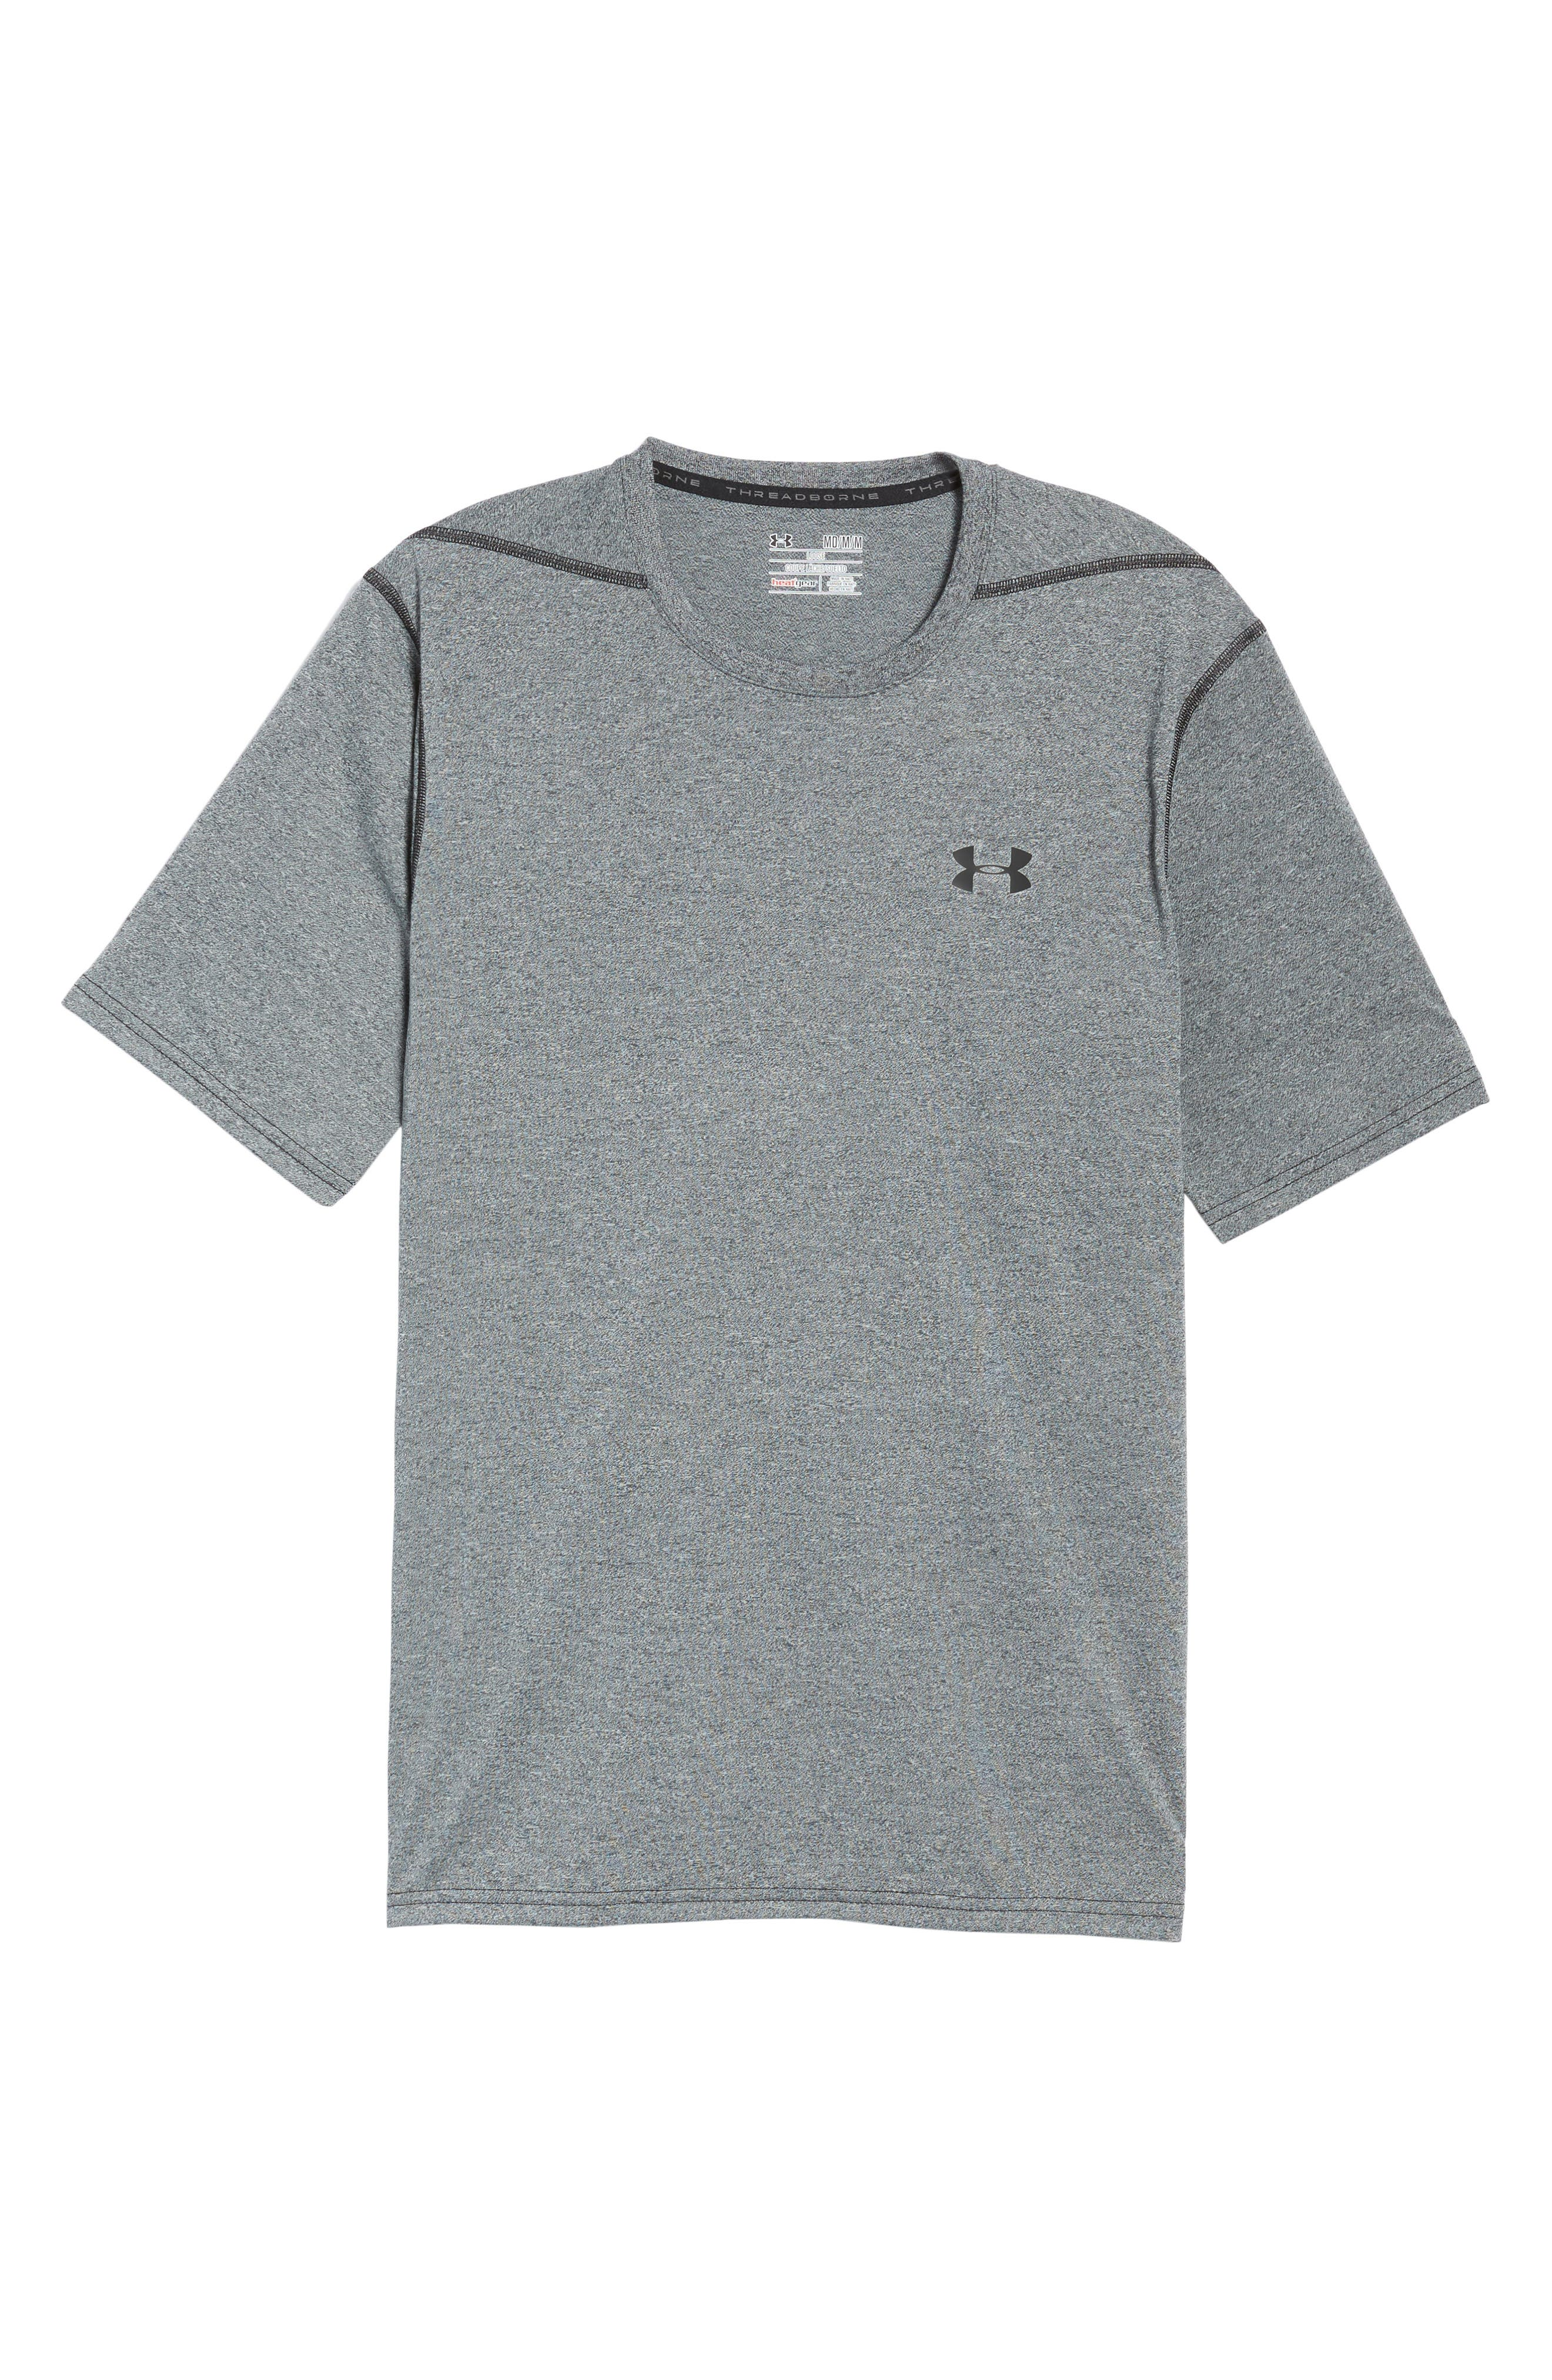 Regular Fit Threadborne T-Shirt,                             Alternate thumbnail 6, color,                             021